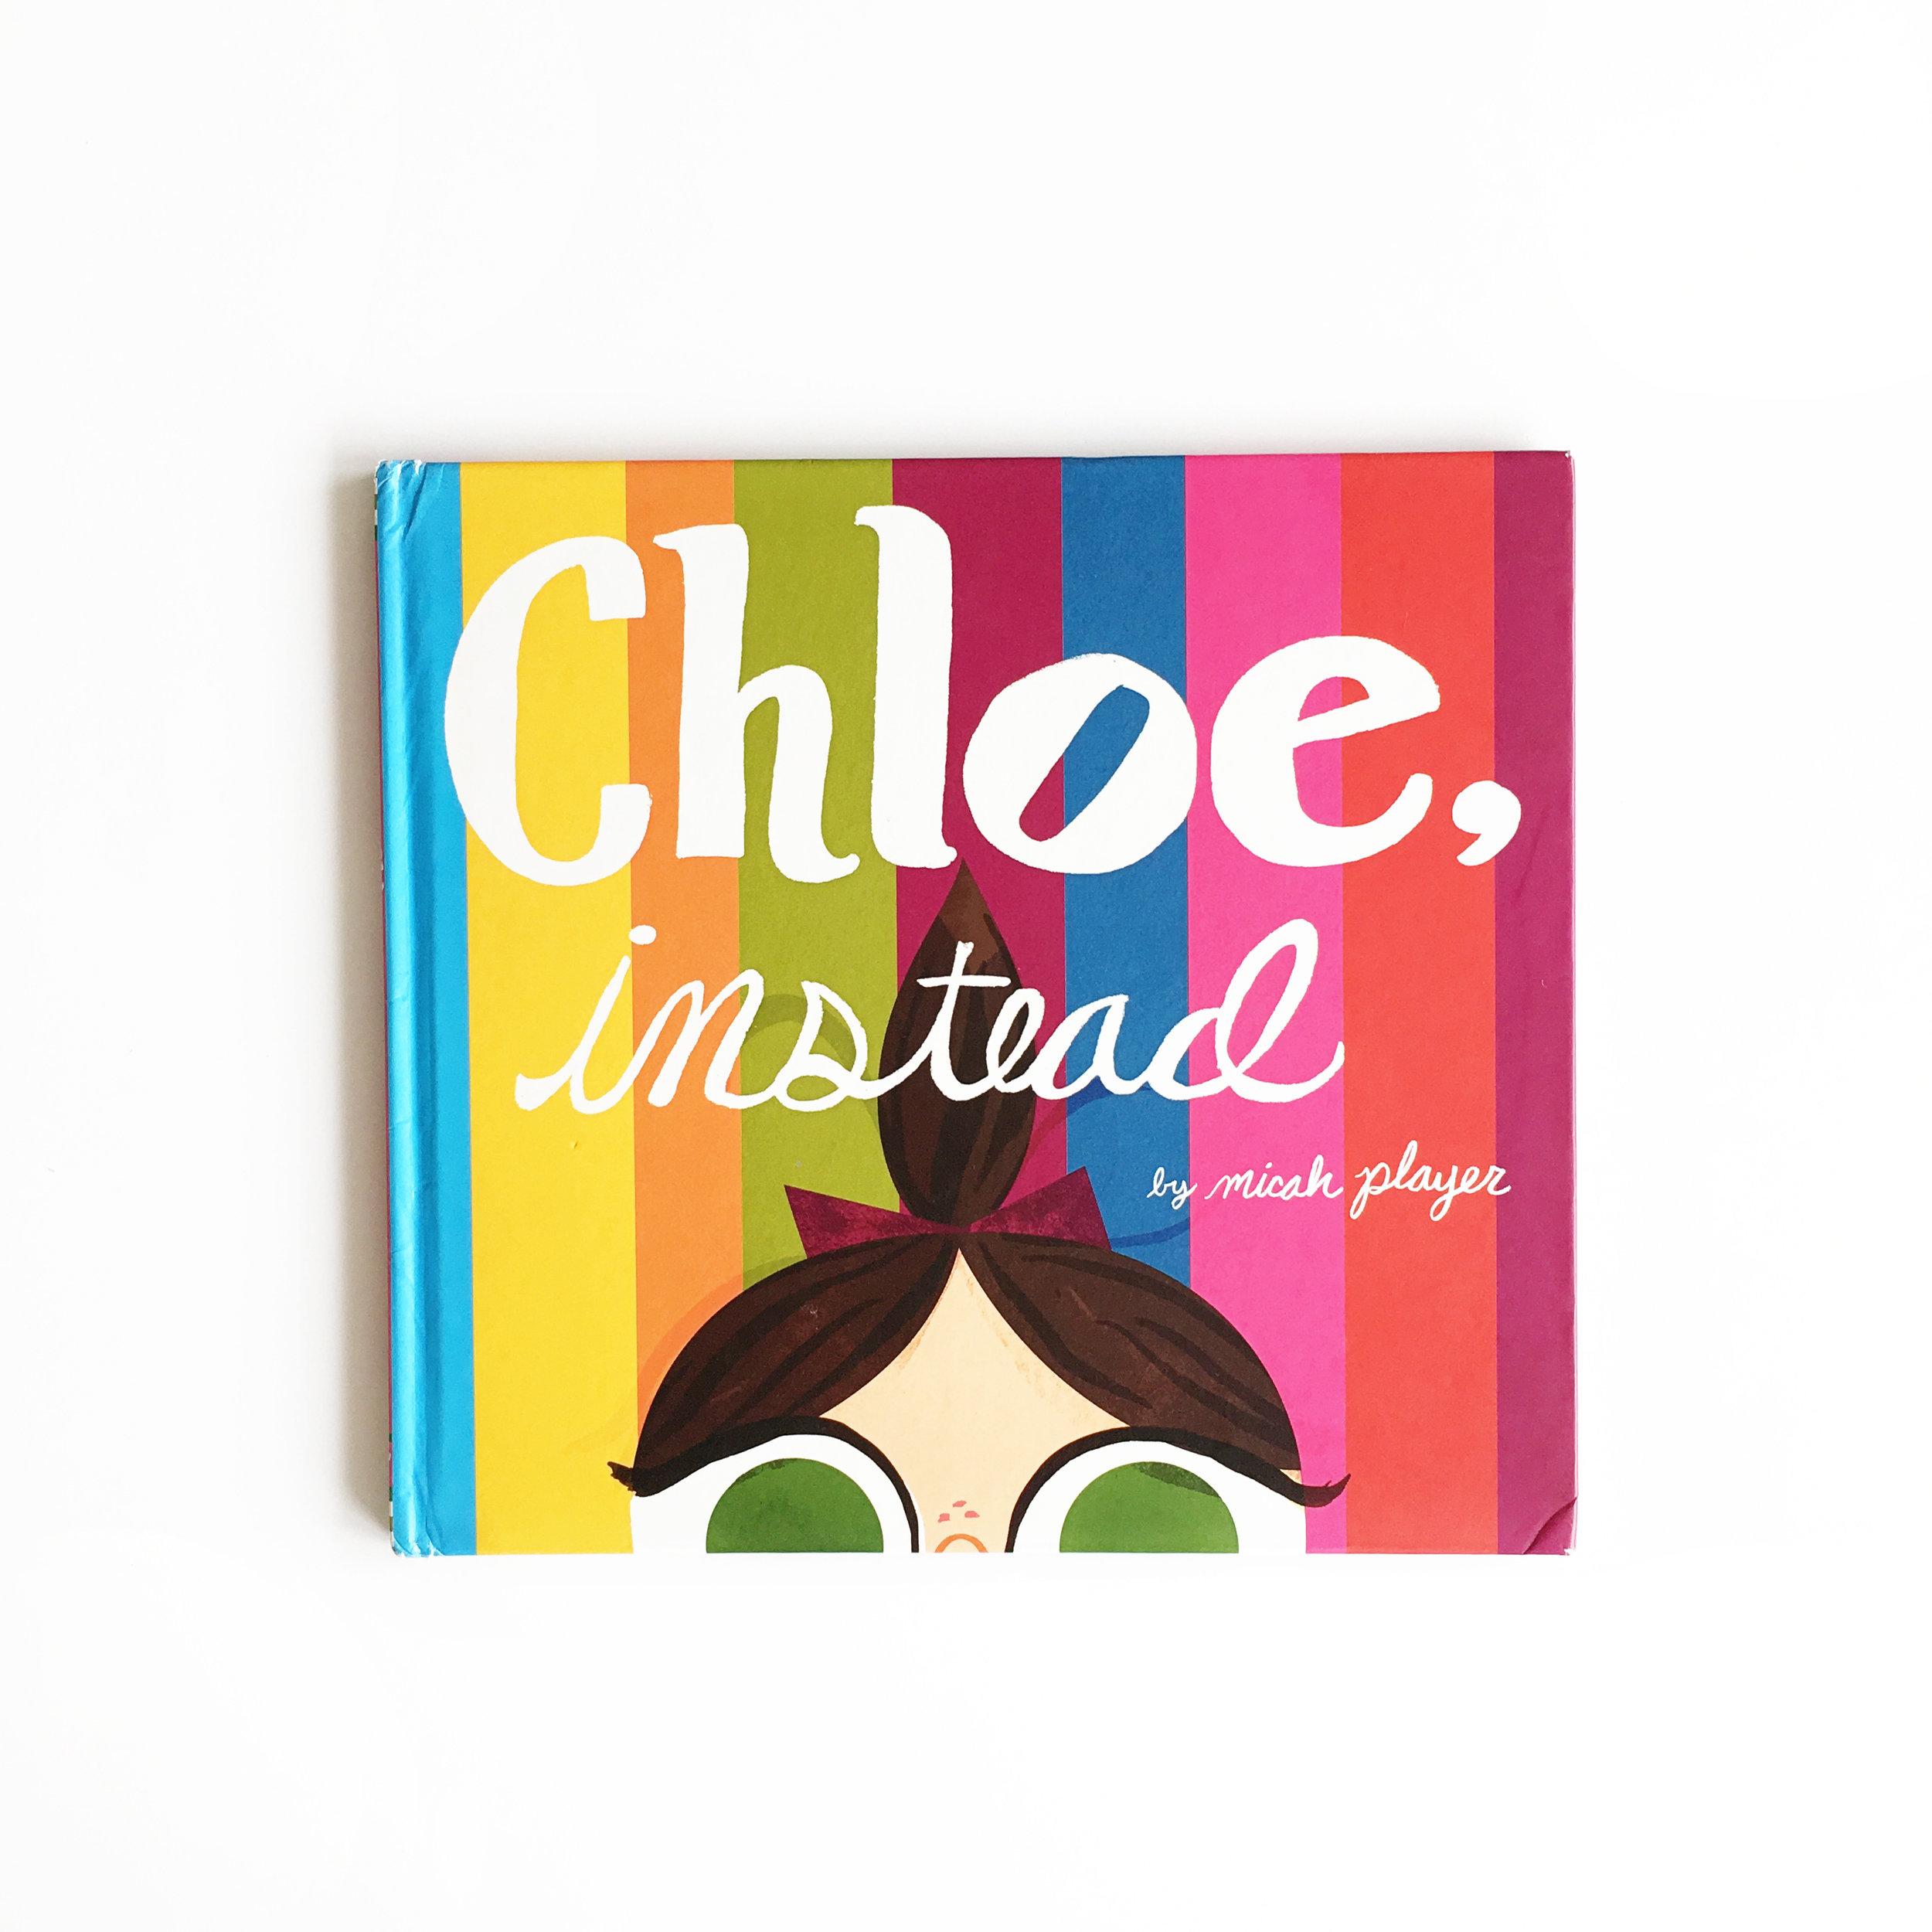 Chloe, Instead | Little Lit Book Series